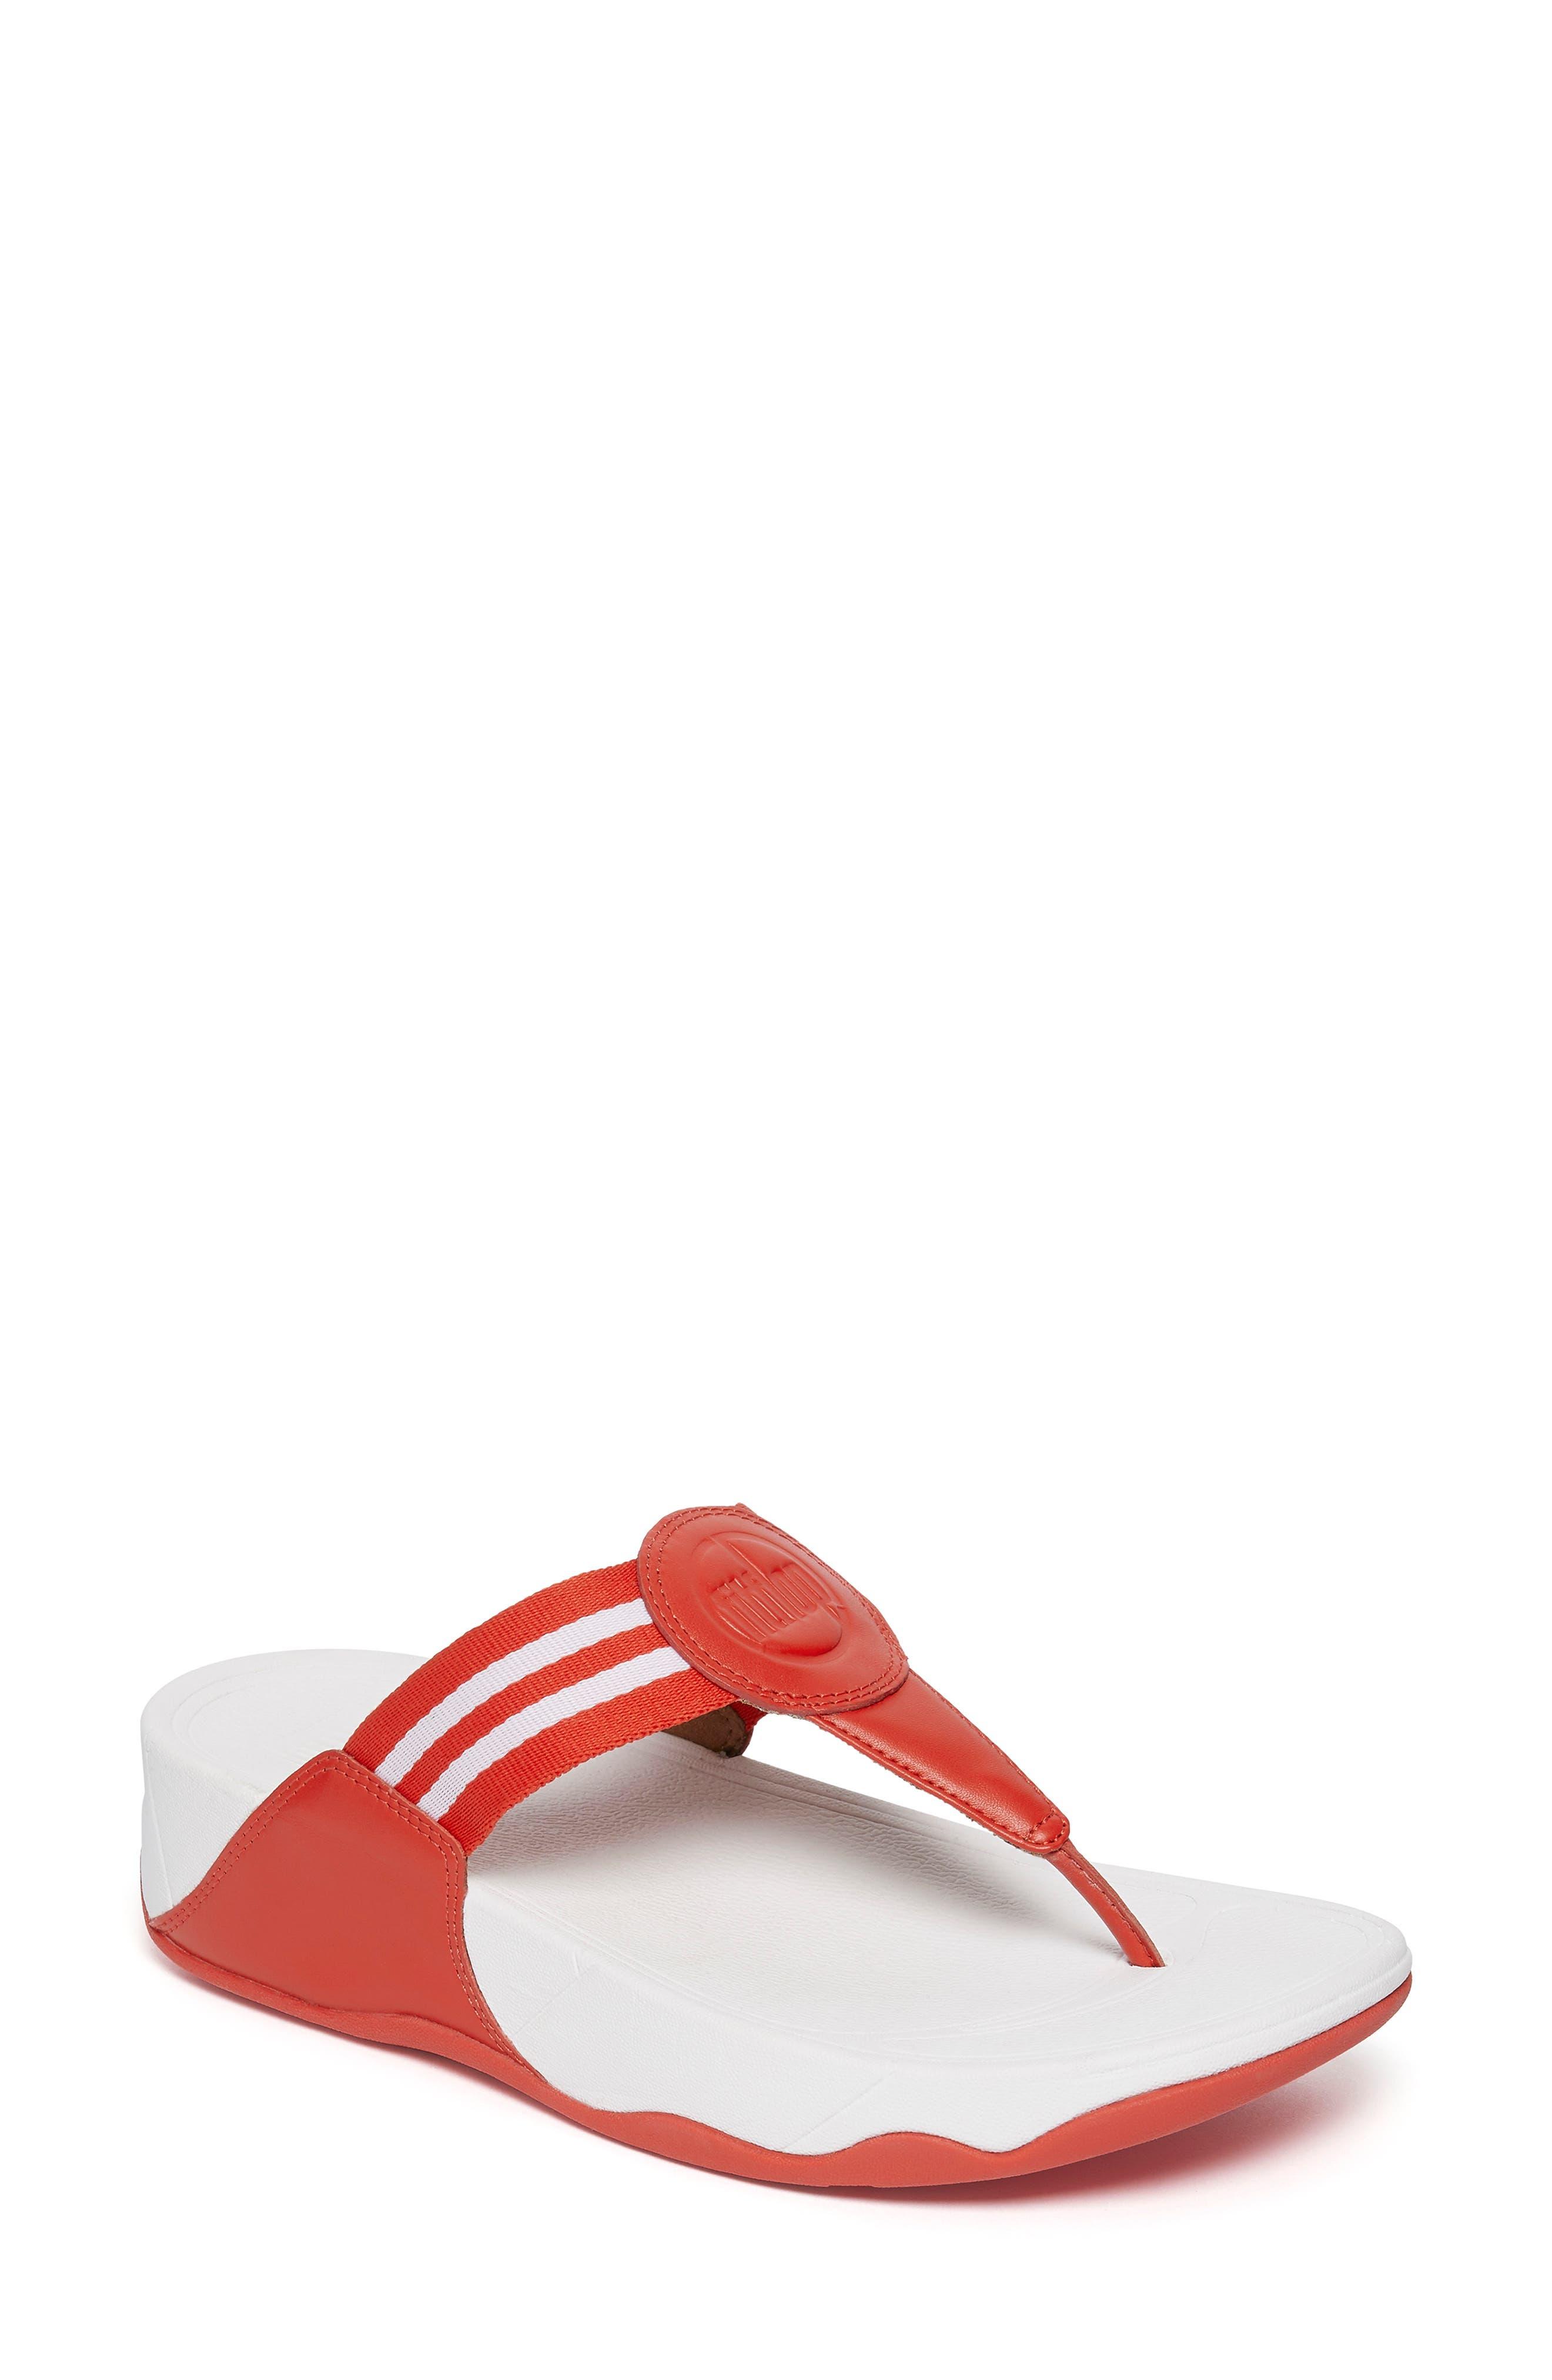 Walkstar Flip Flop